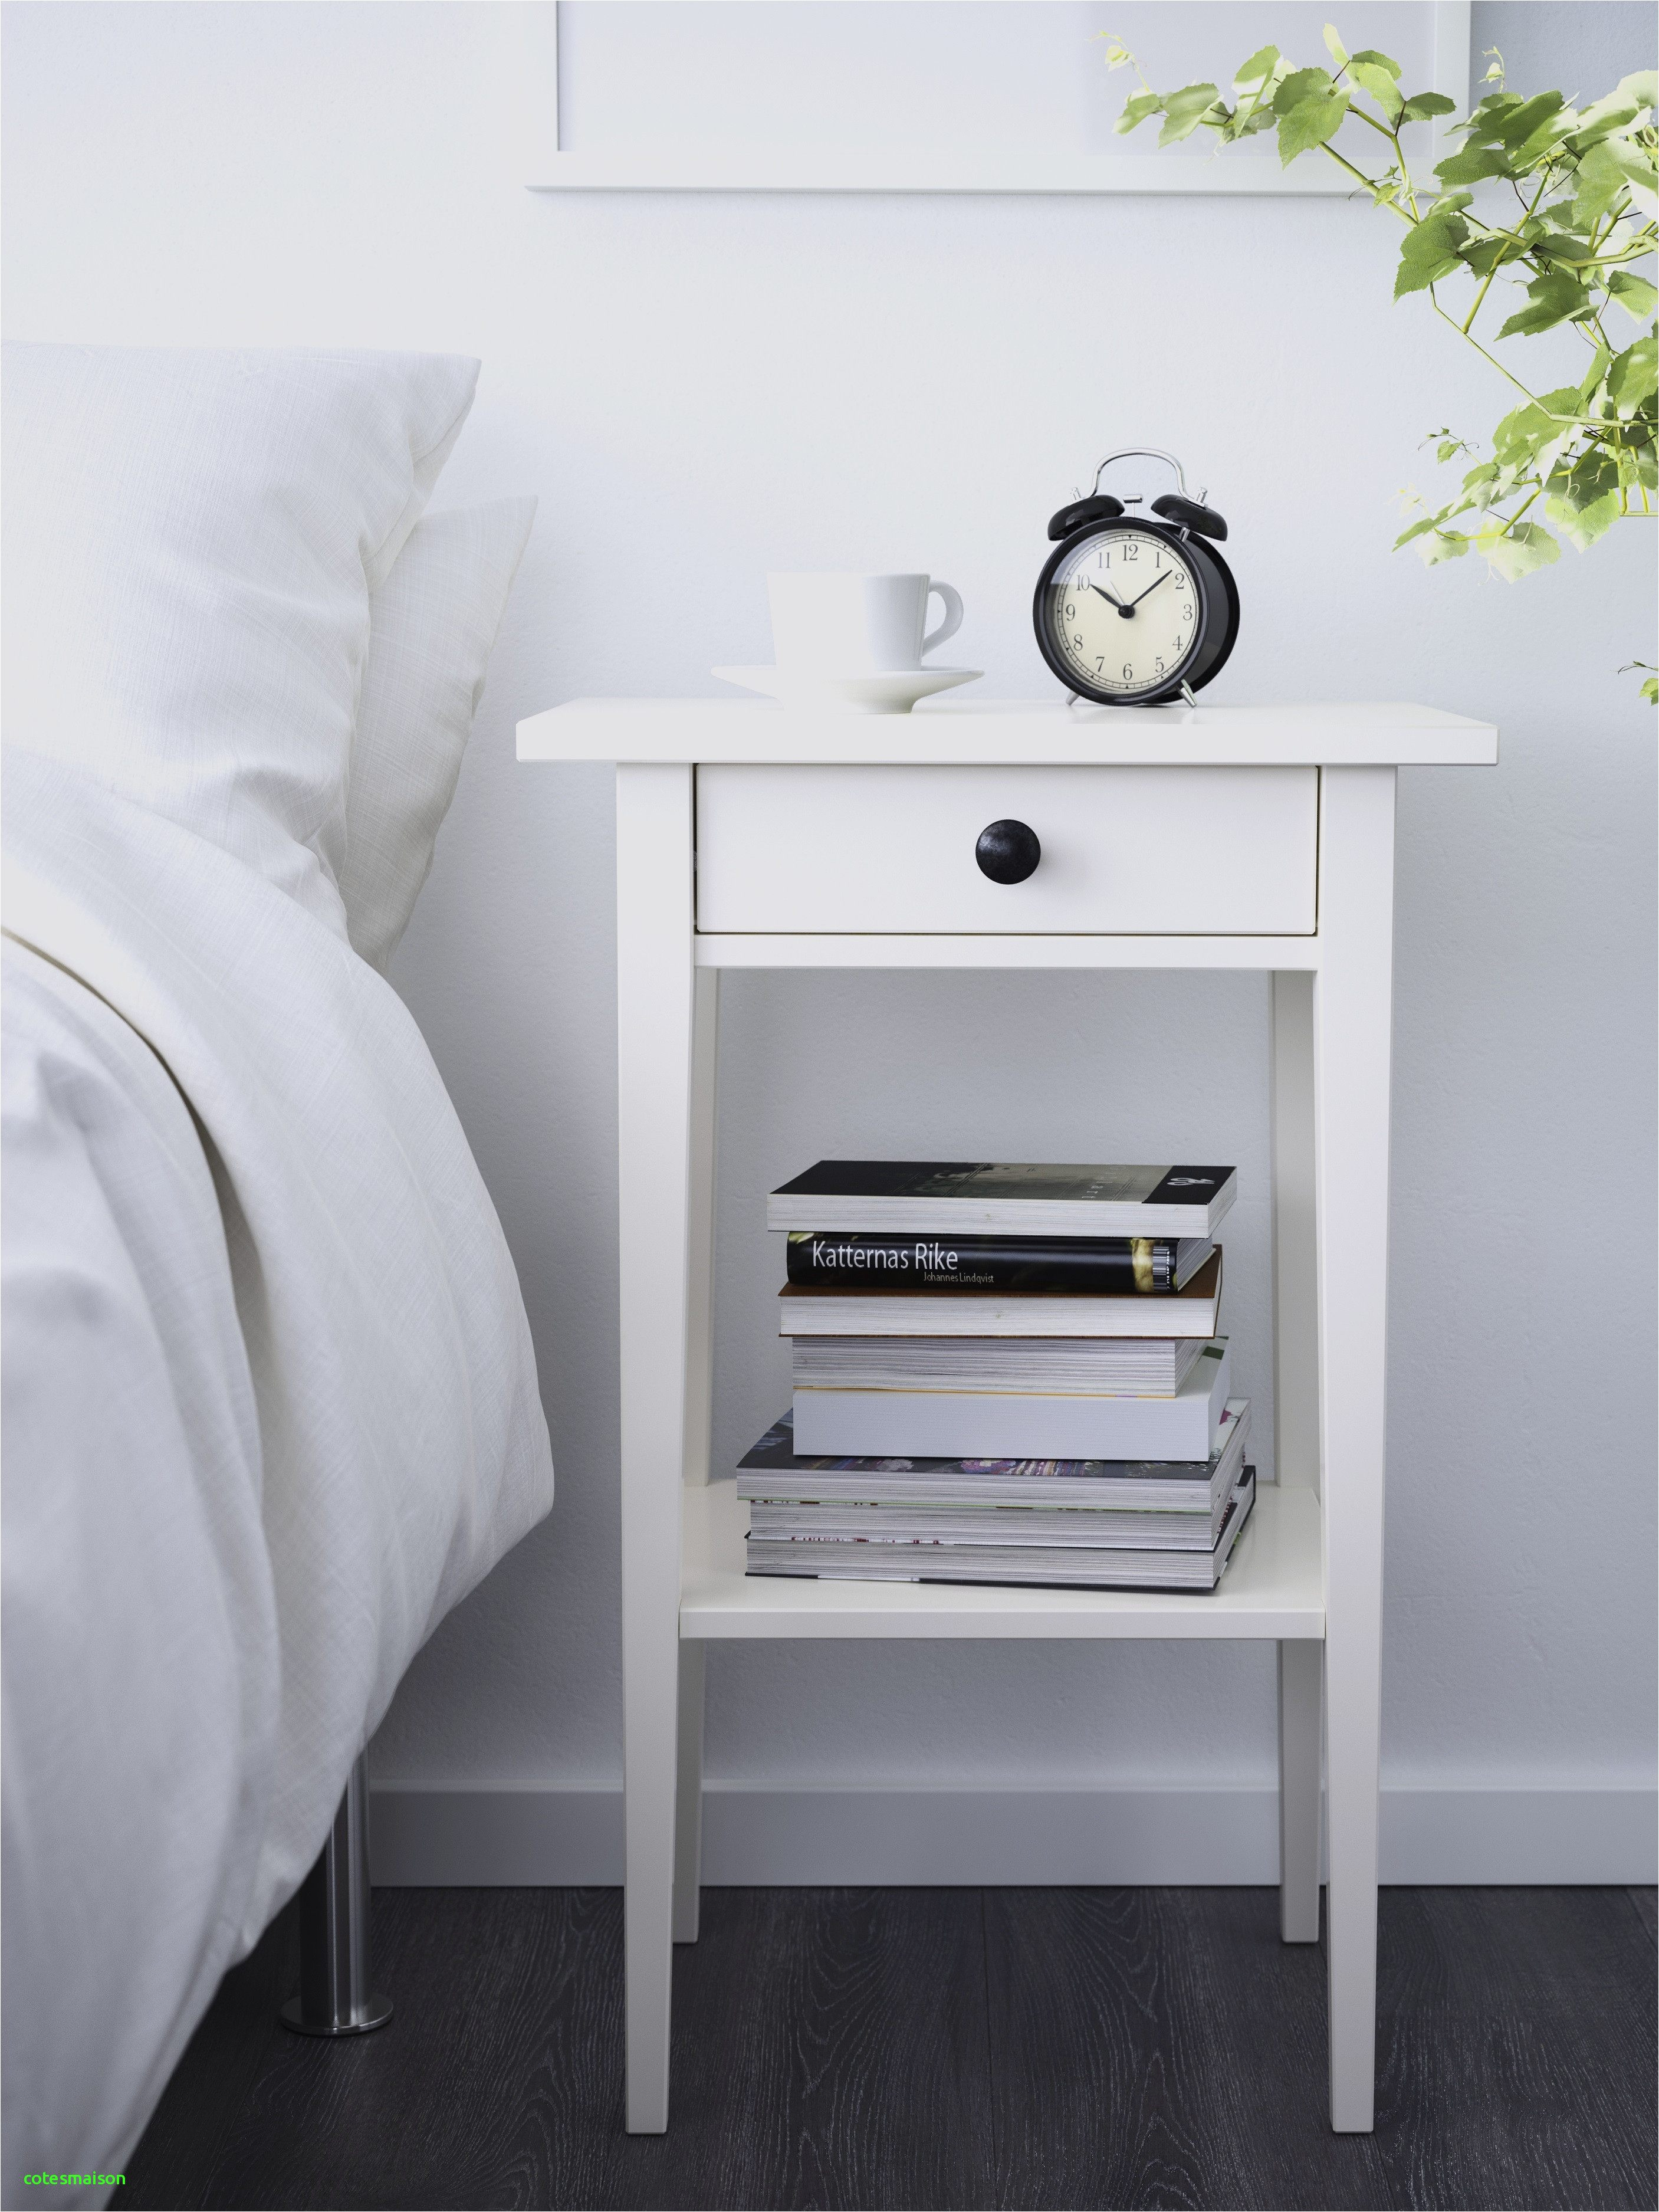 Lit Estrade Ikea Nouveau Lit Estrade Ikea Impressionnant Stock Lit Estrade Chambre Studio